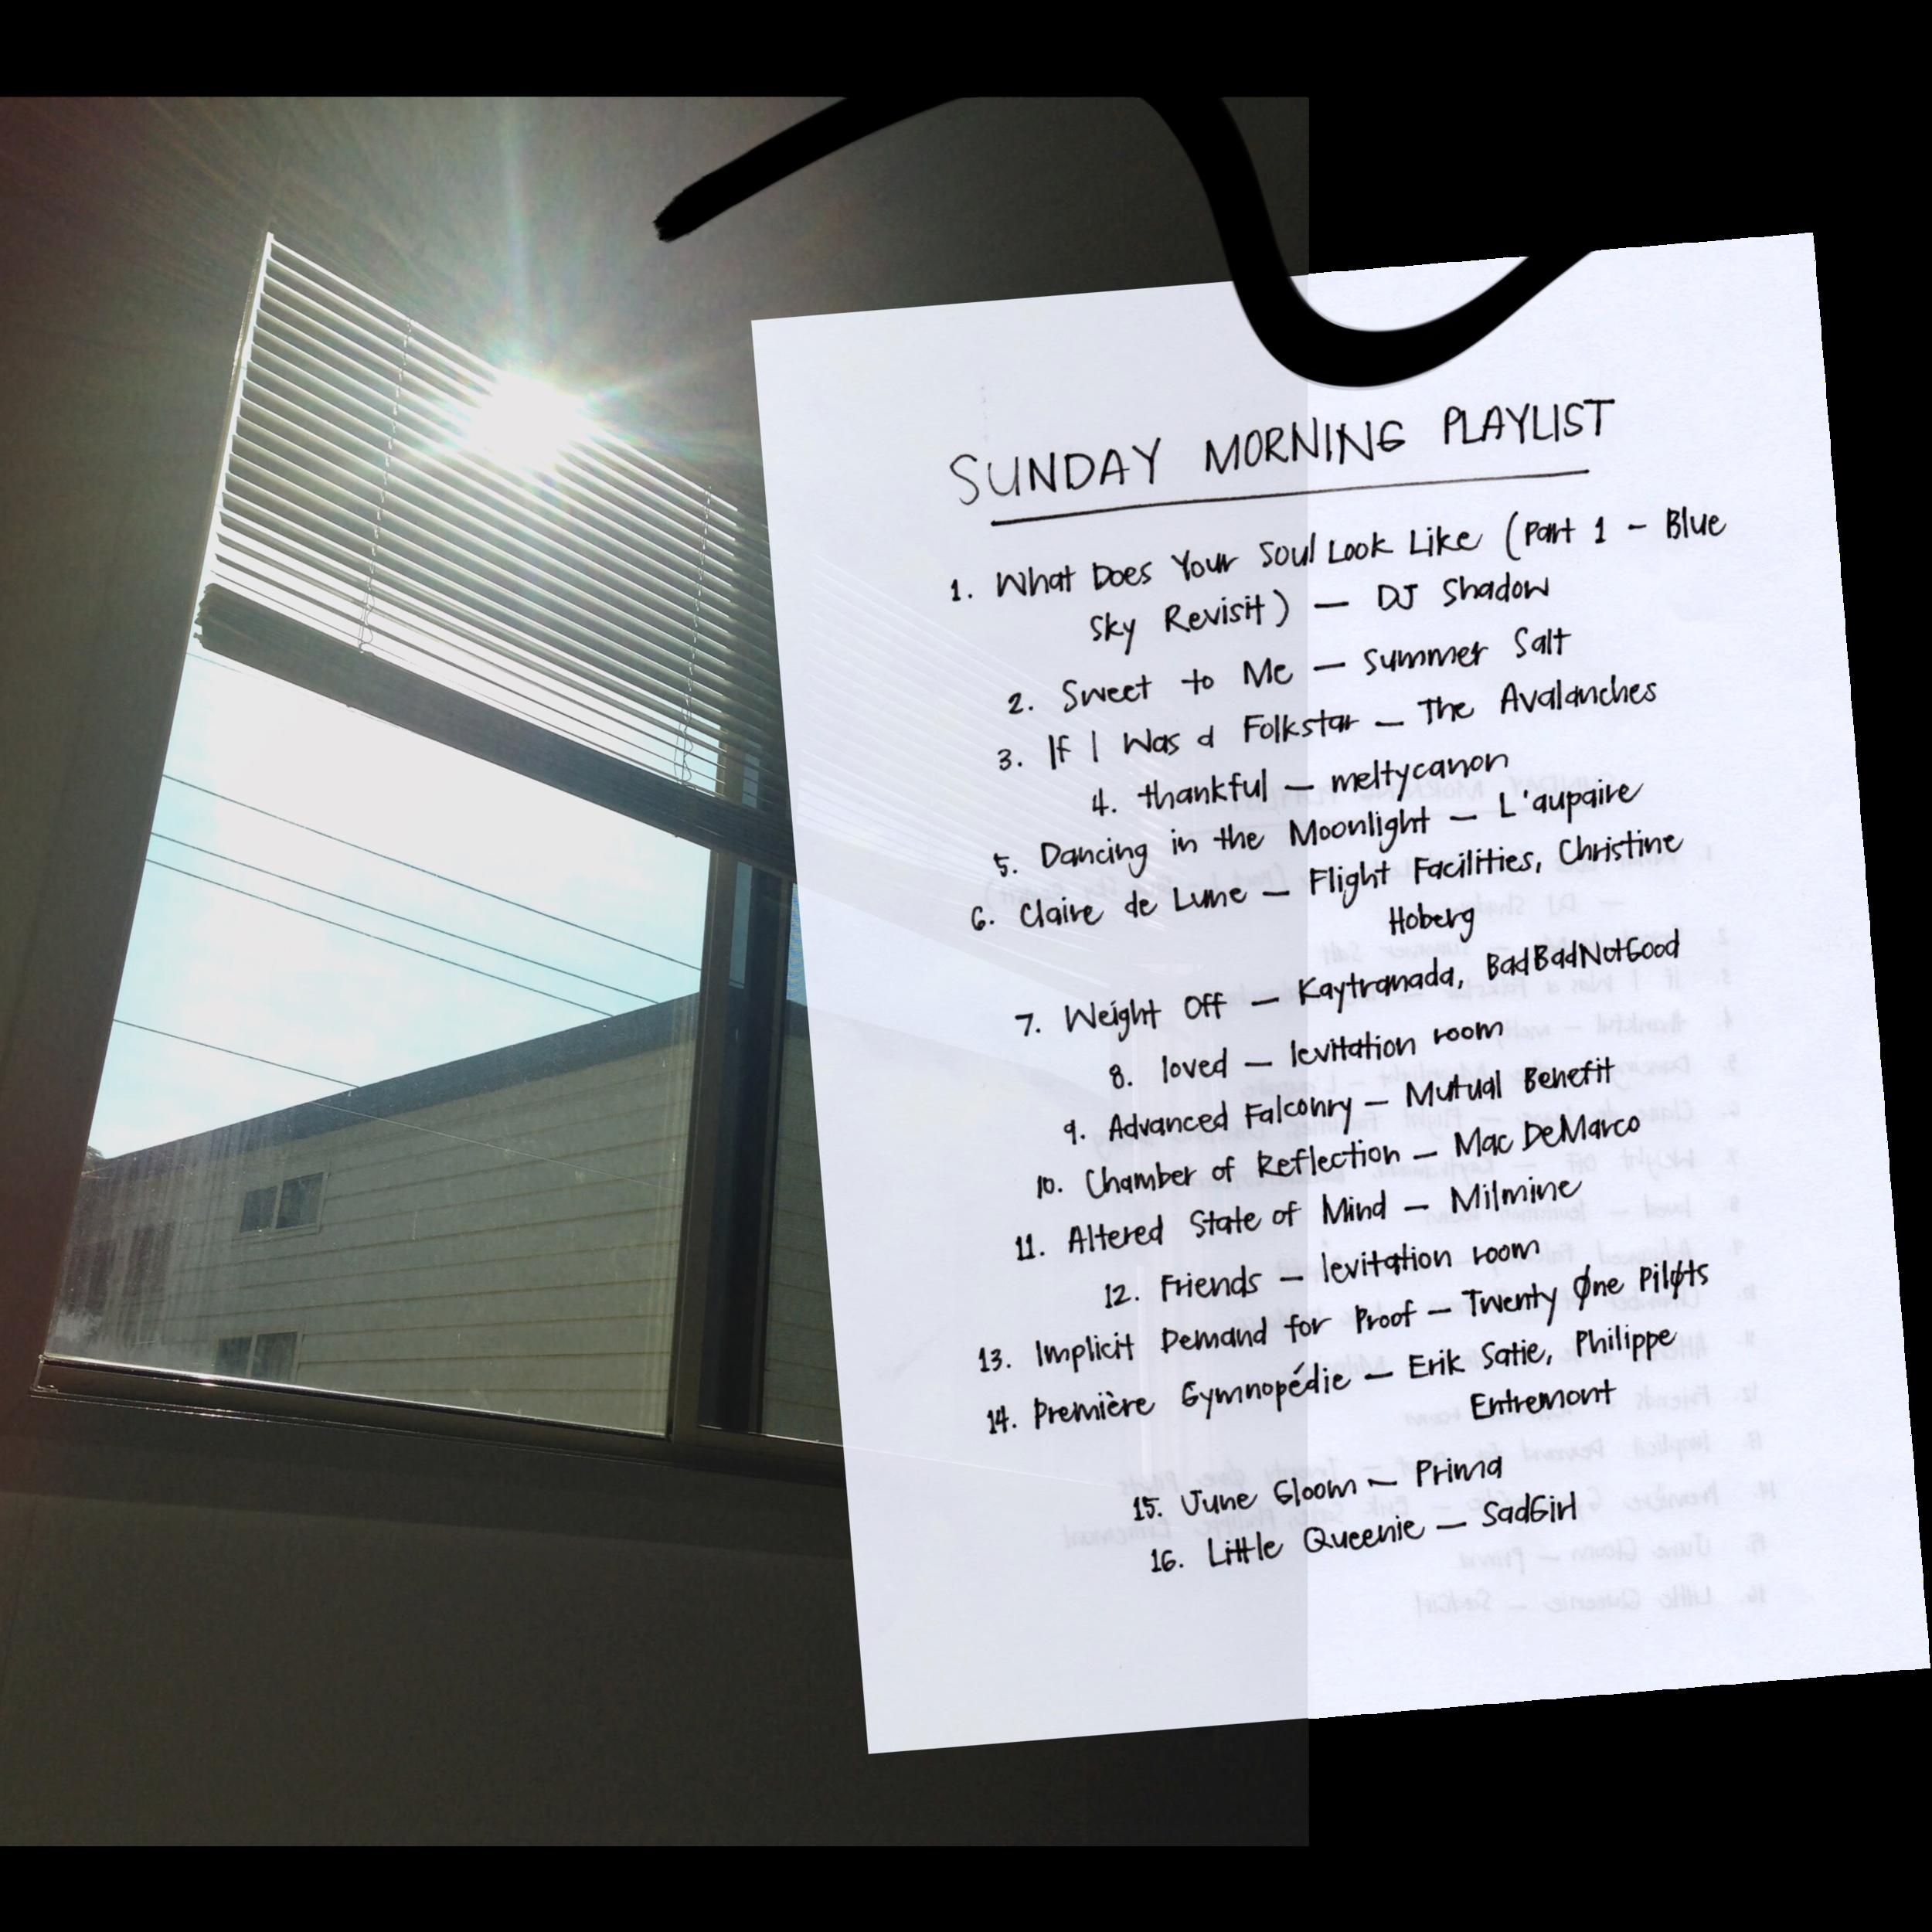 Sunday Morning Playlist – carmelajulian